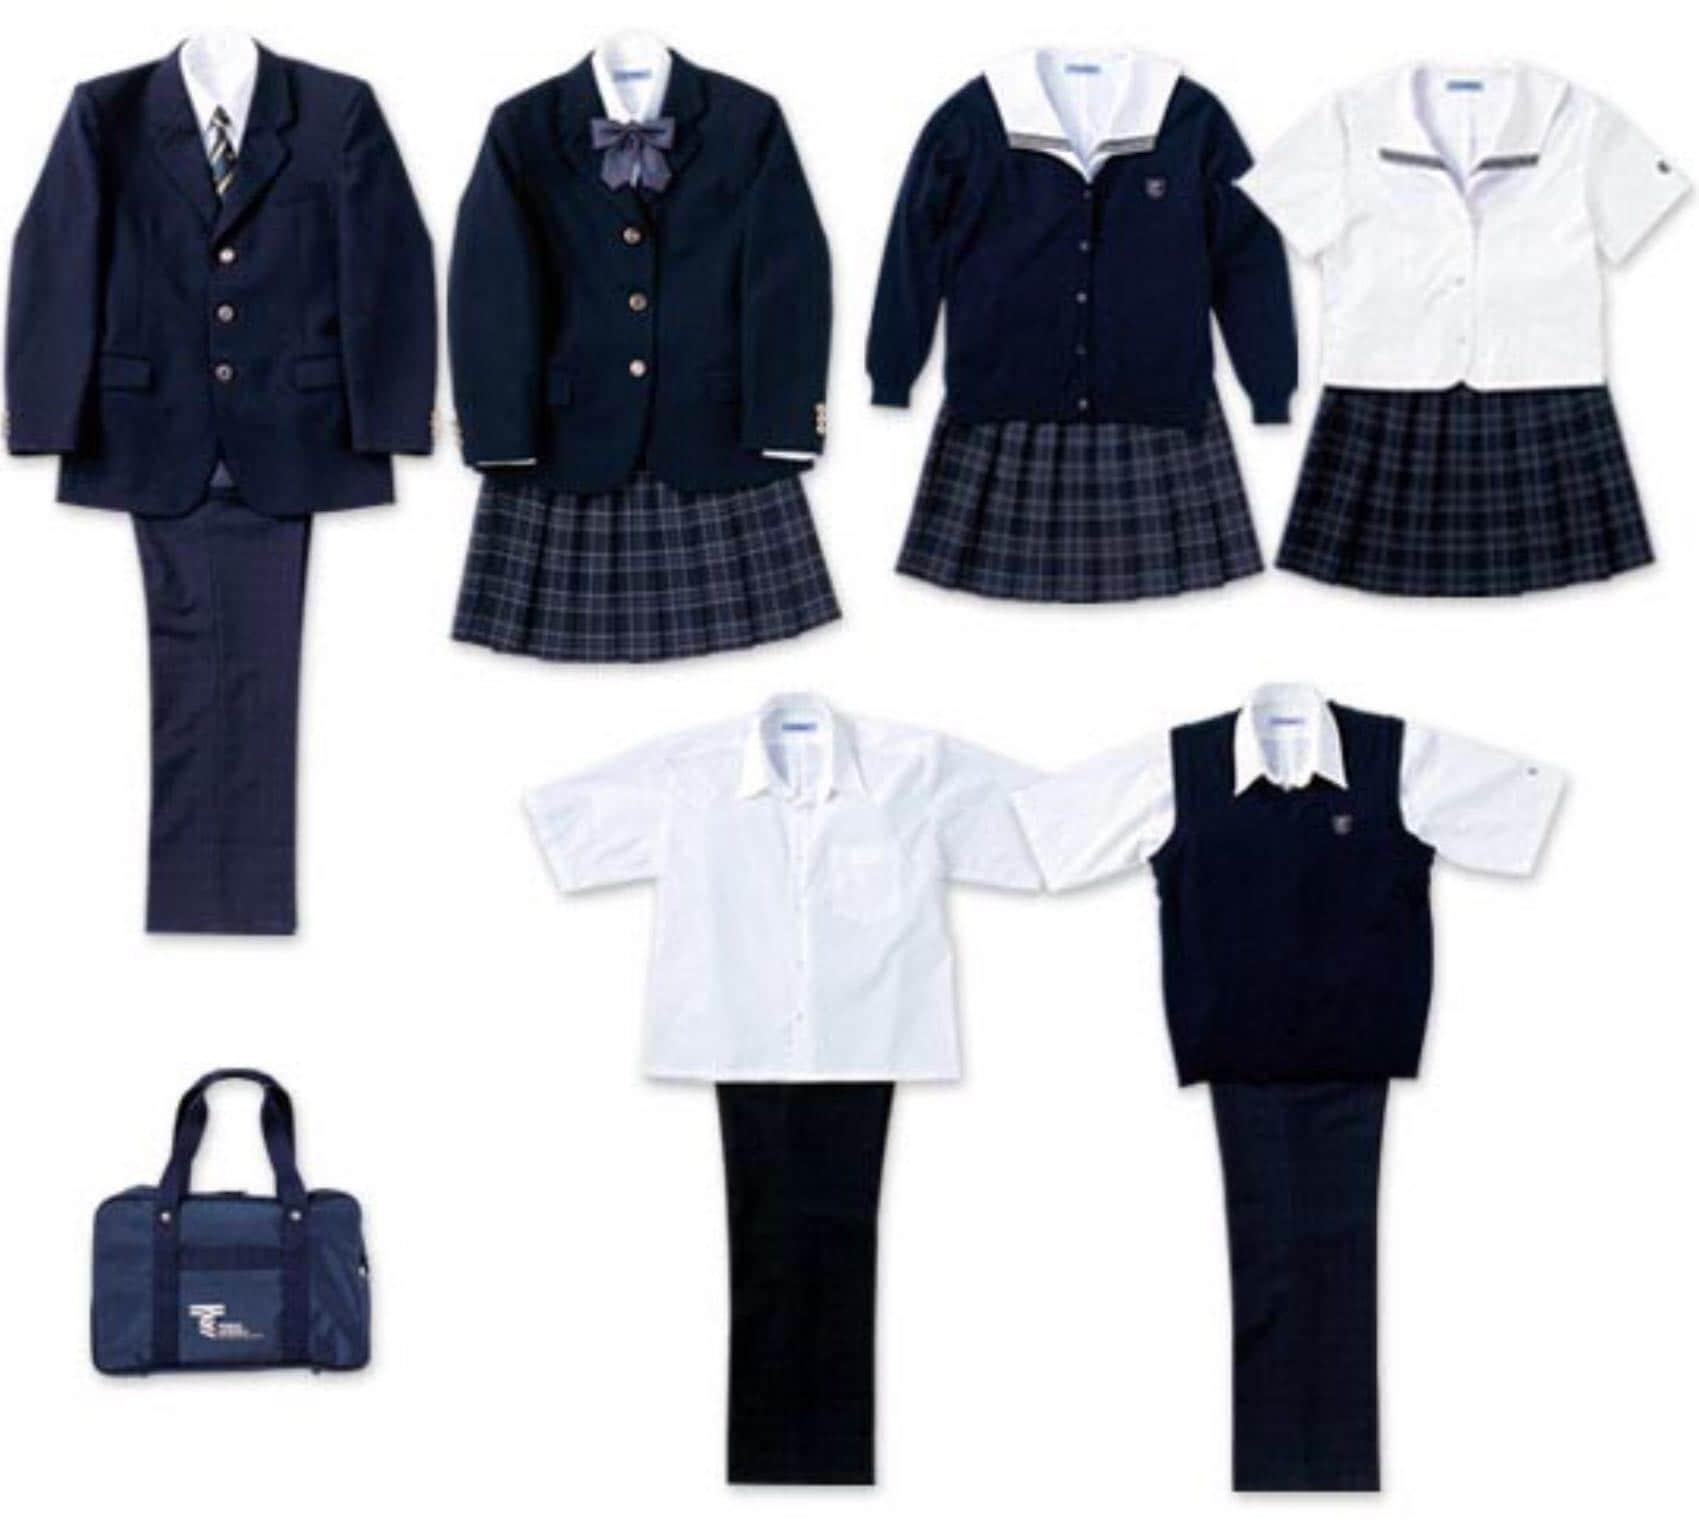 Top 100 School Uniform Manufacturers in Kolkata - Justdial